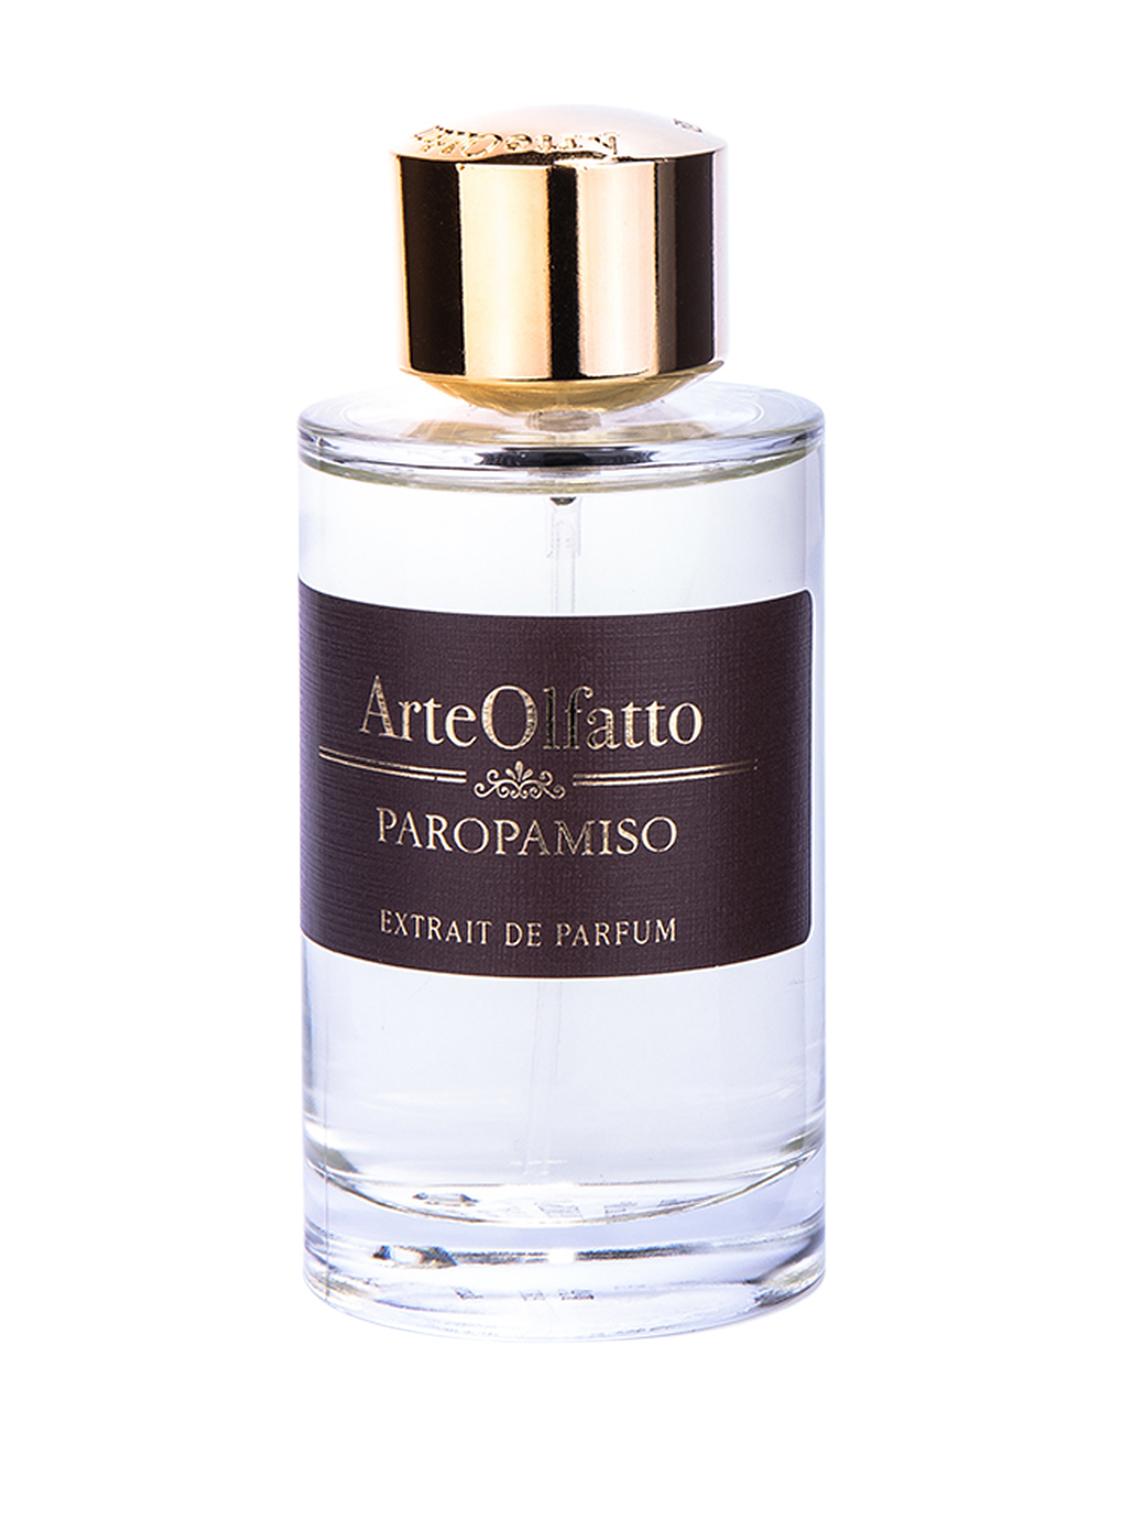 Image of Arte Olfatto Paropamiso Eau de Parfum 100 ml